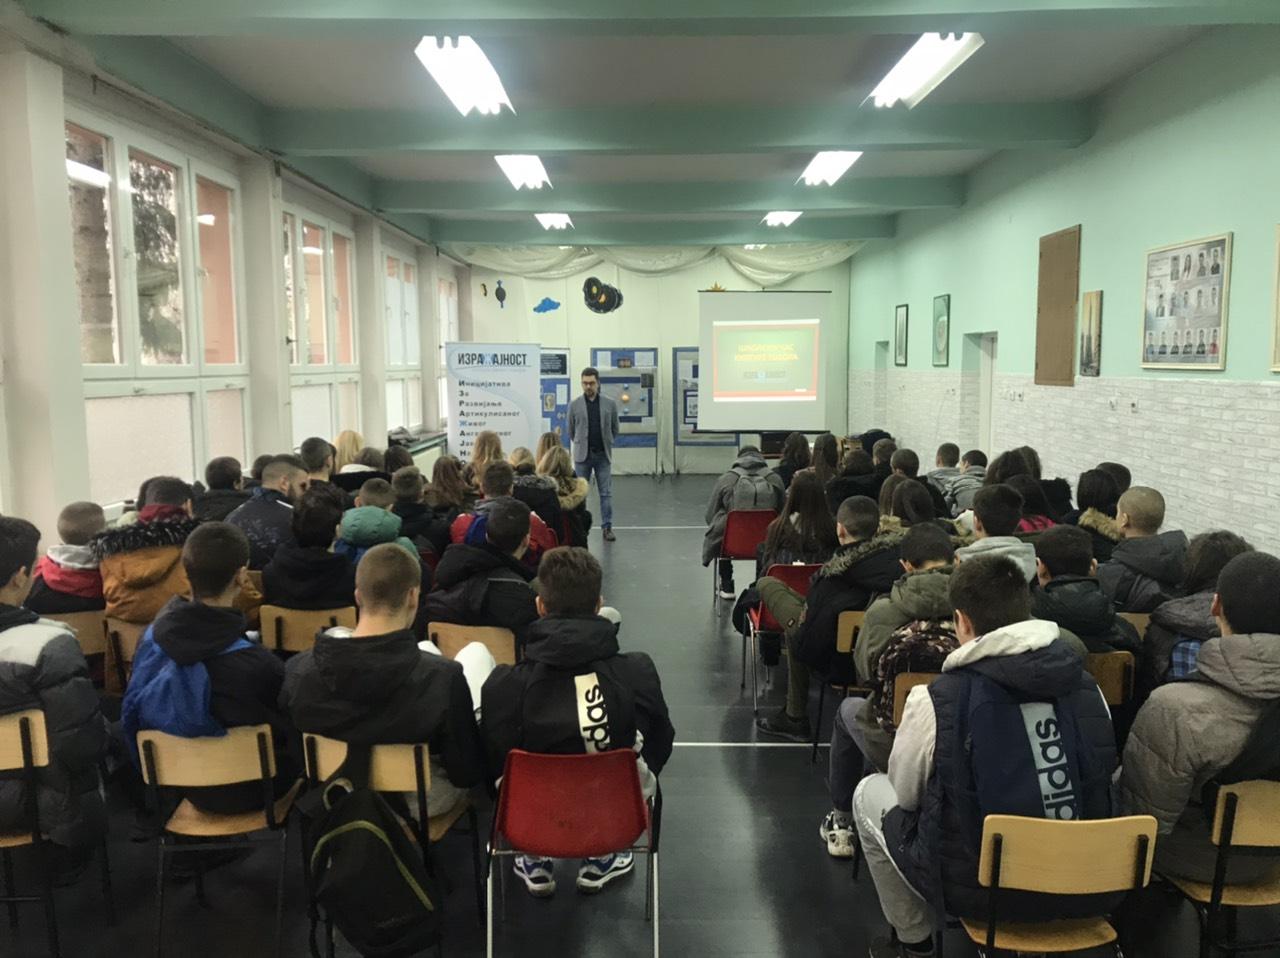 Školski čas kulture govora - Srednja stručna školi u Vrbasu